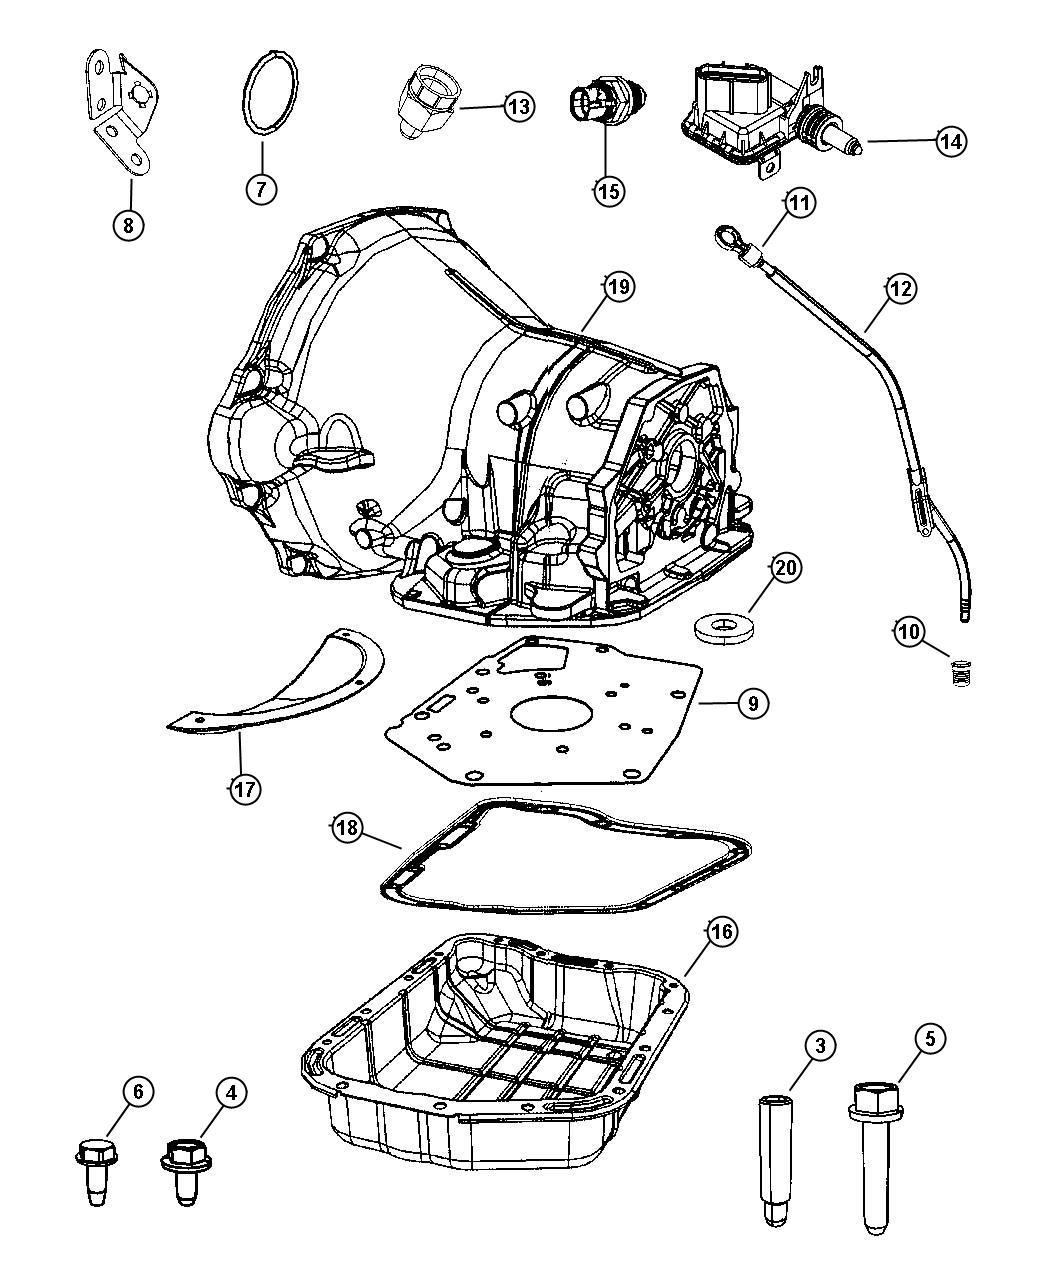 46re transmission diagram choice image diagram design ideas i2162624 46re transmission diagramhtml free dodge van wiring diagrams